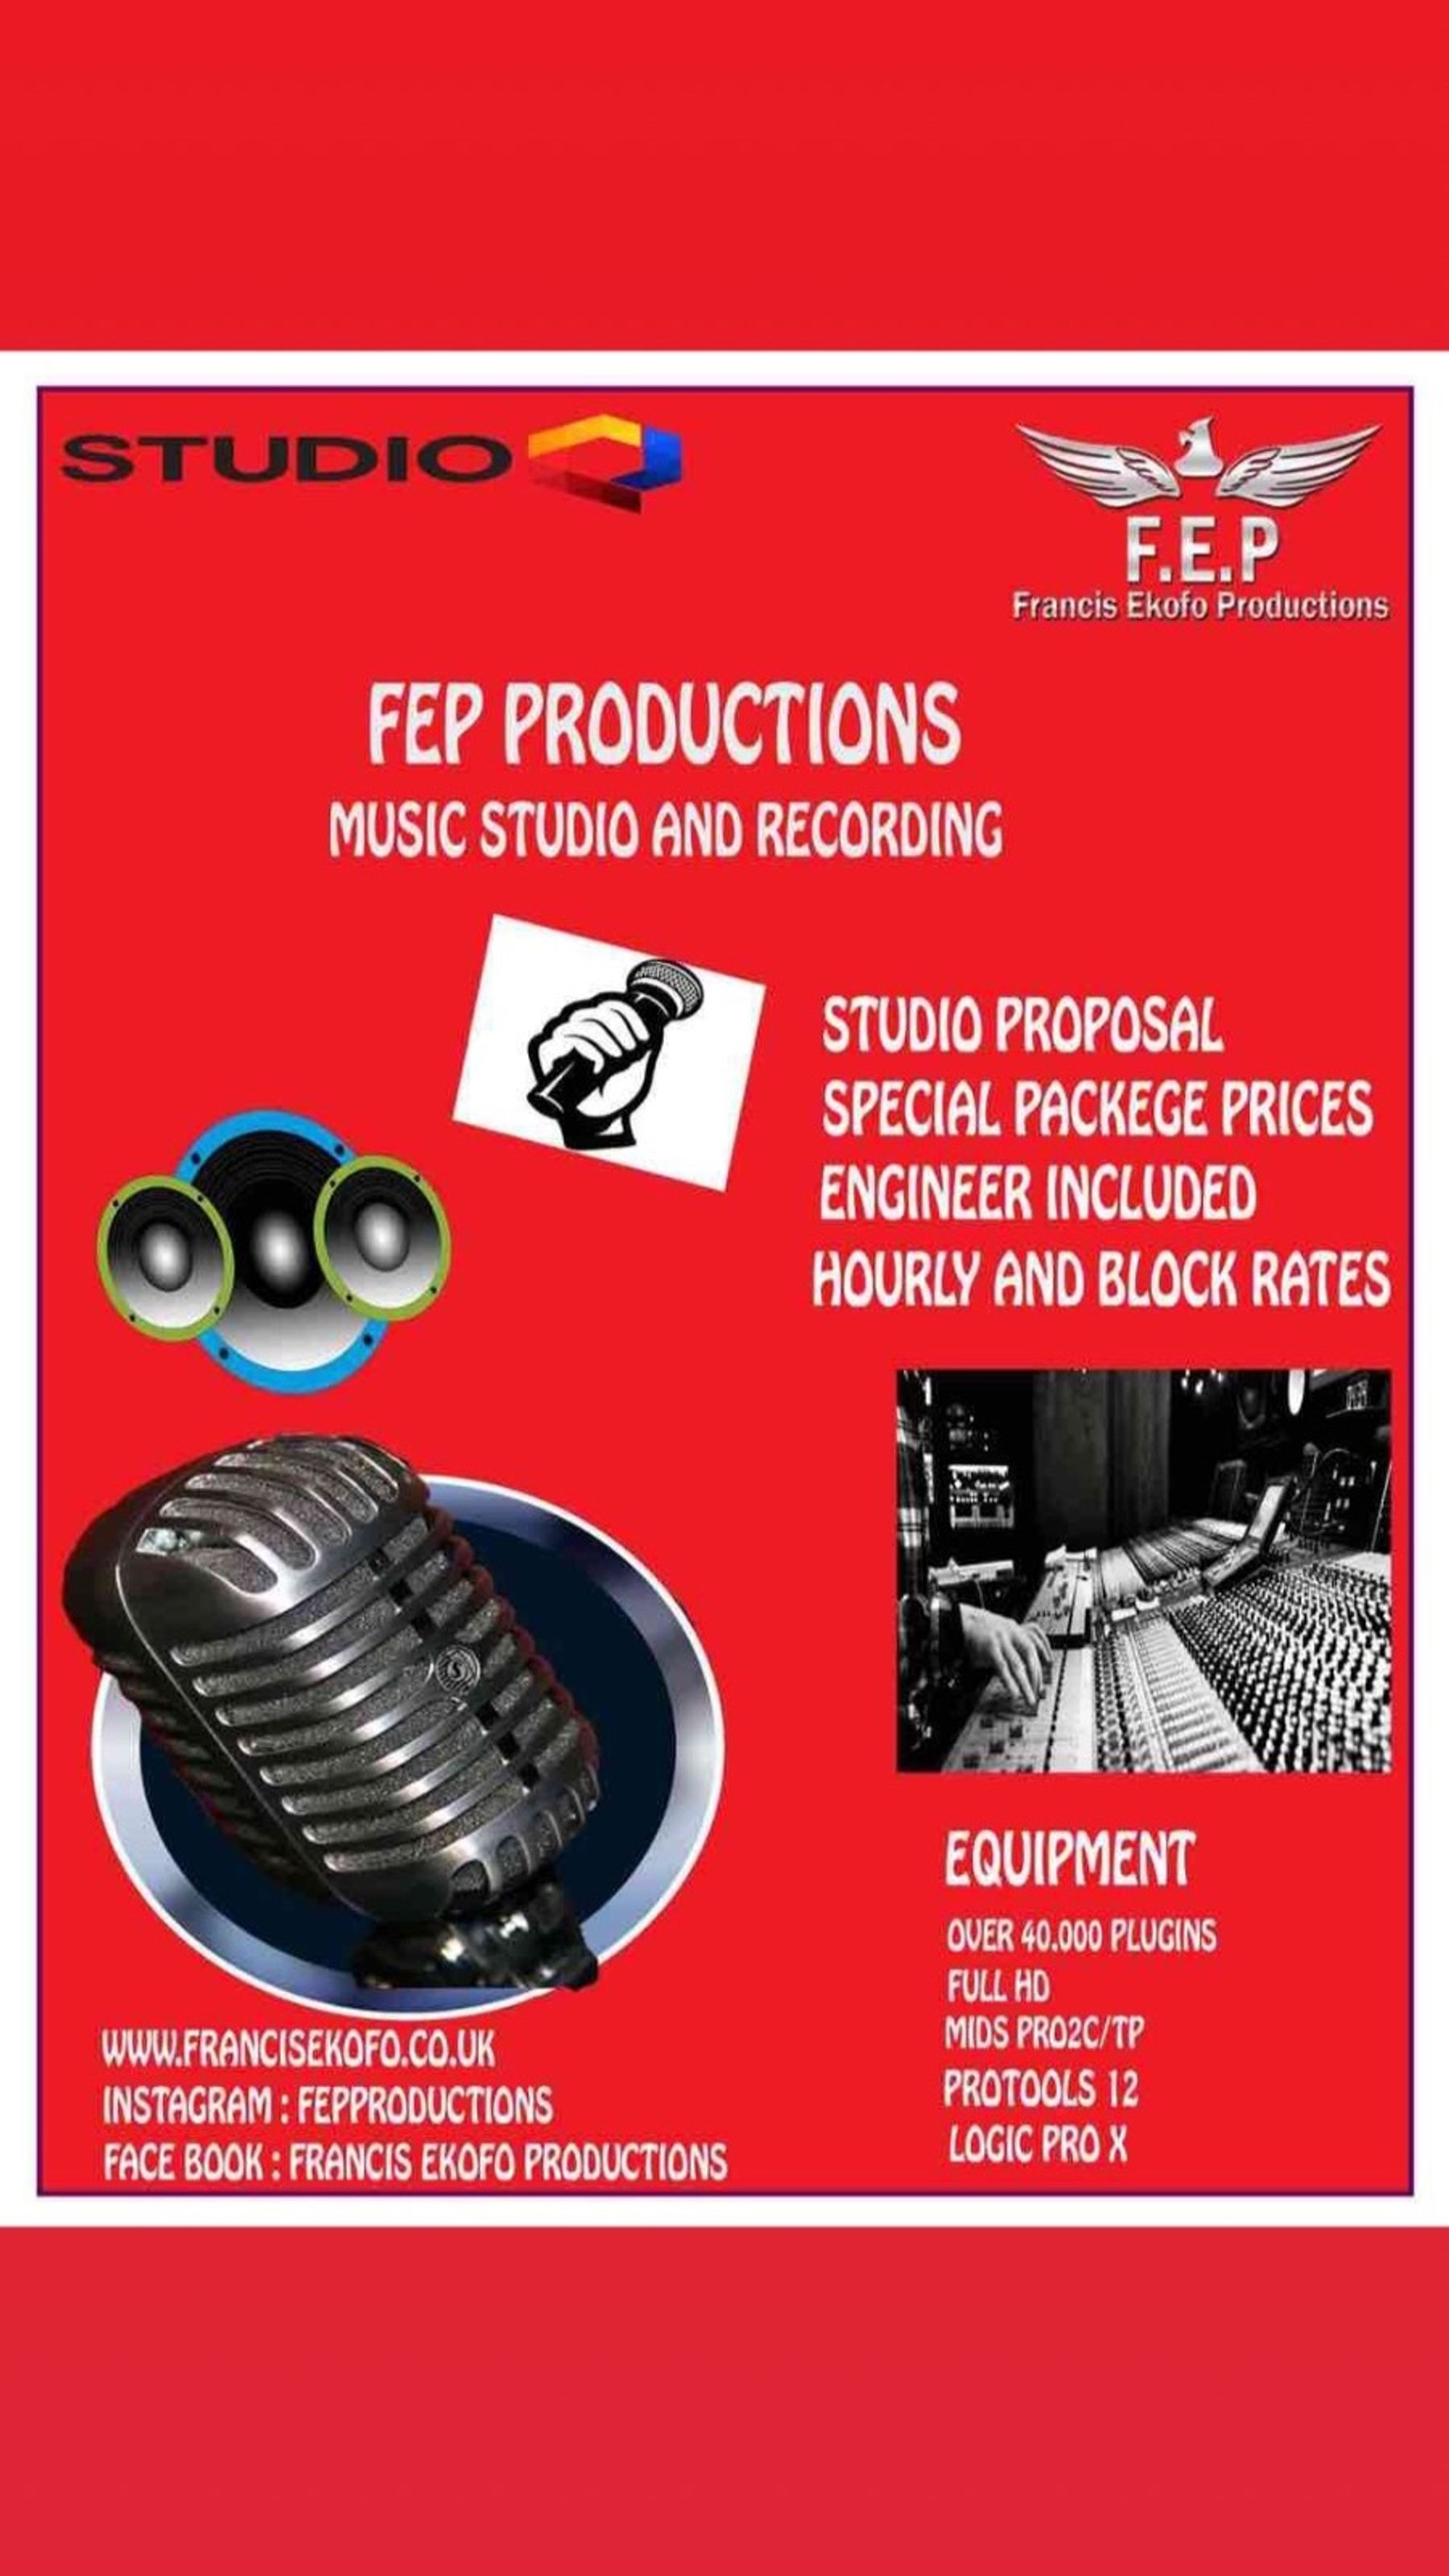 FEP Studio